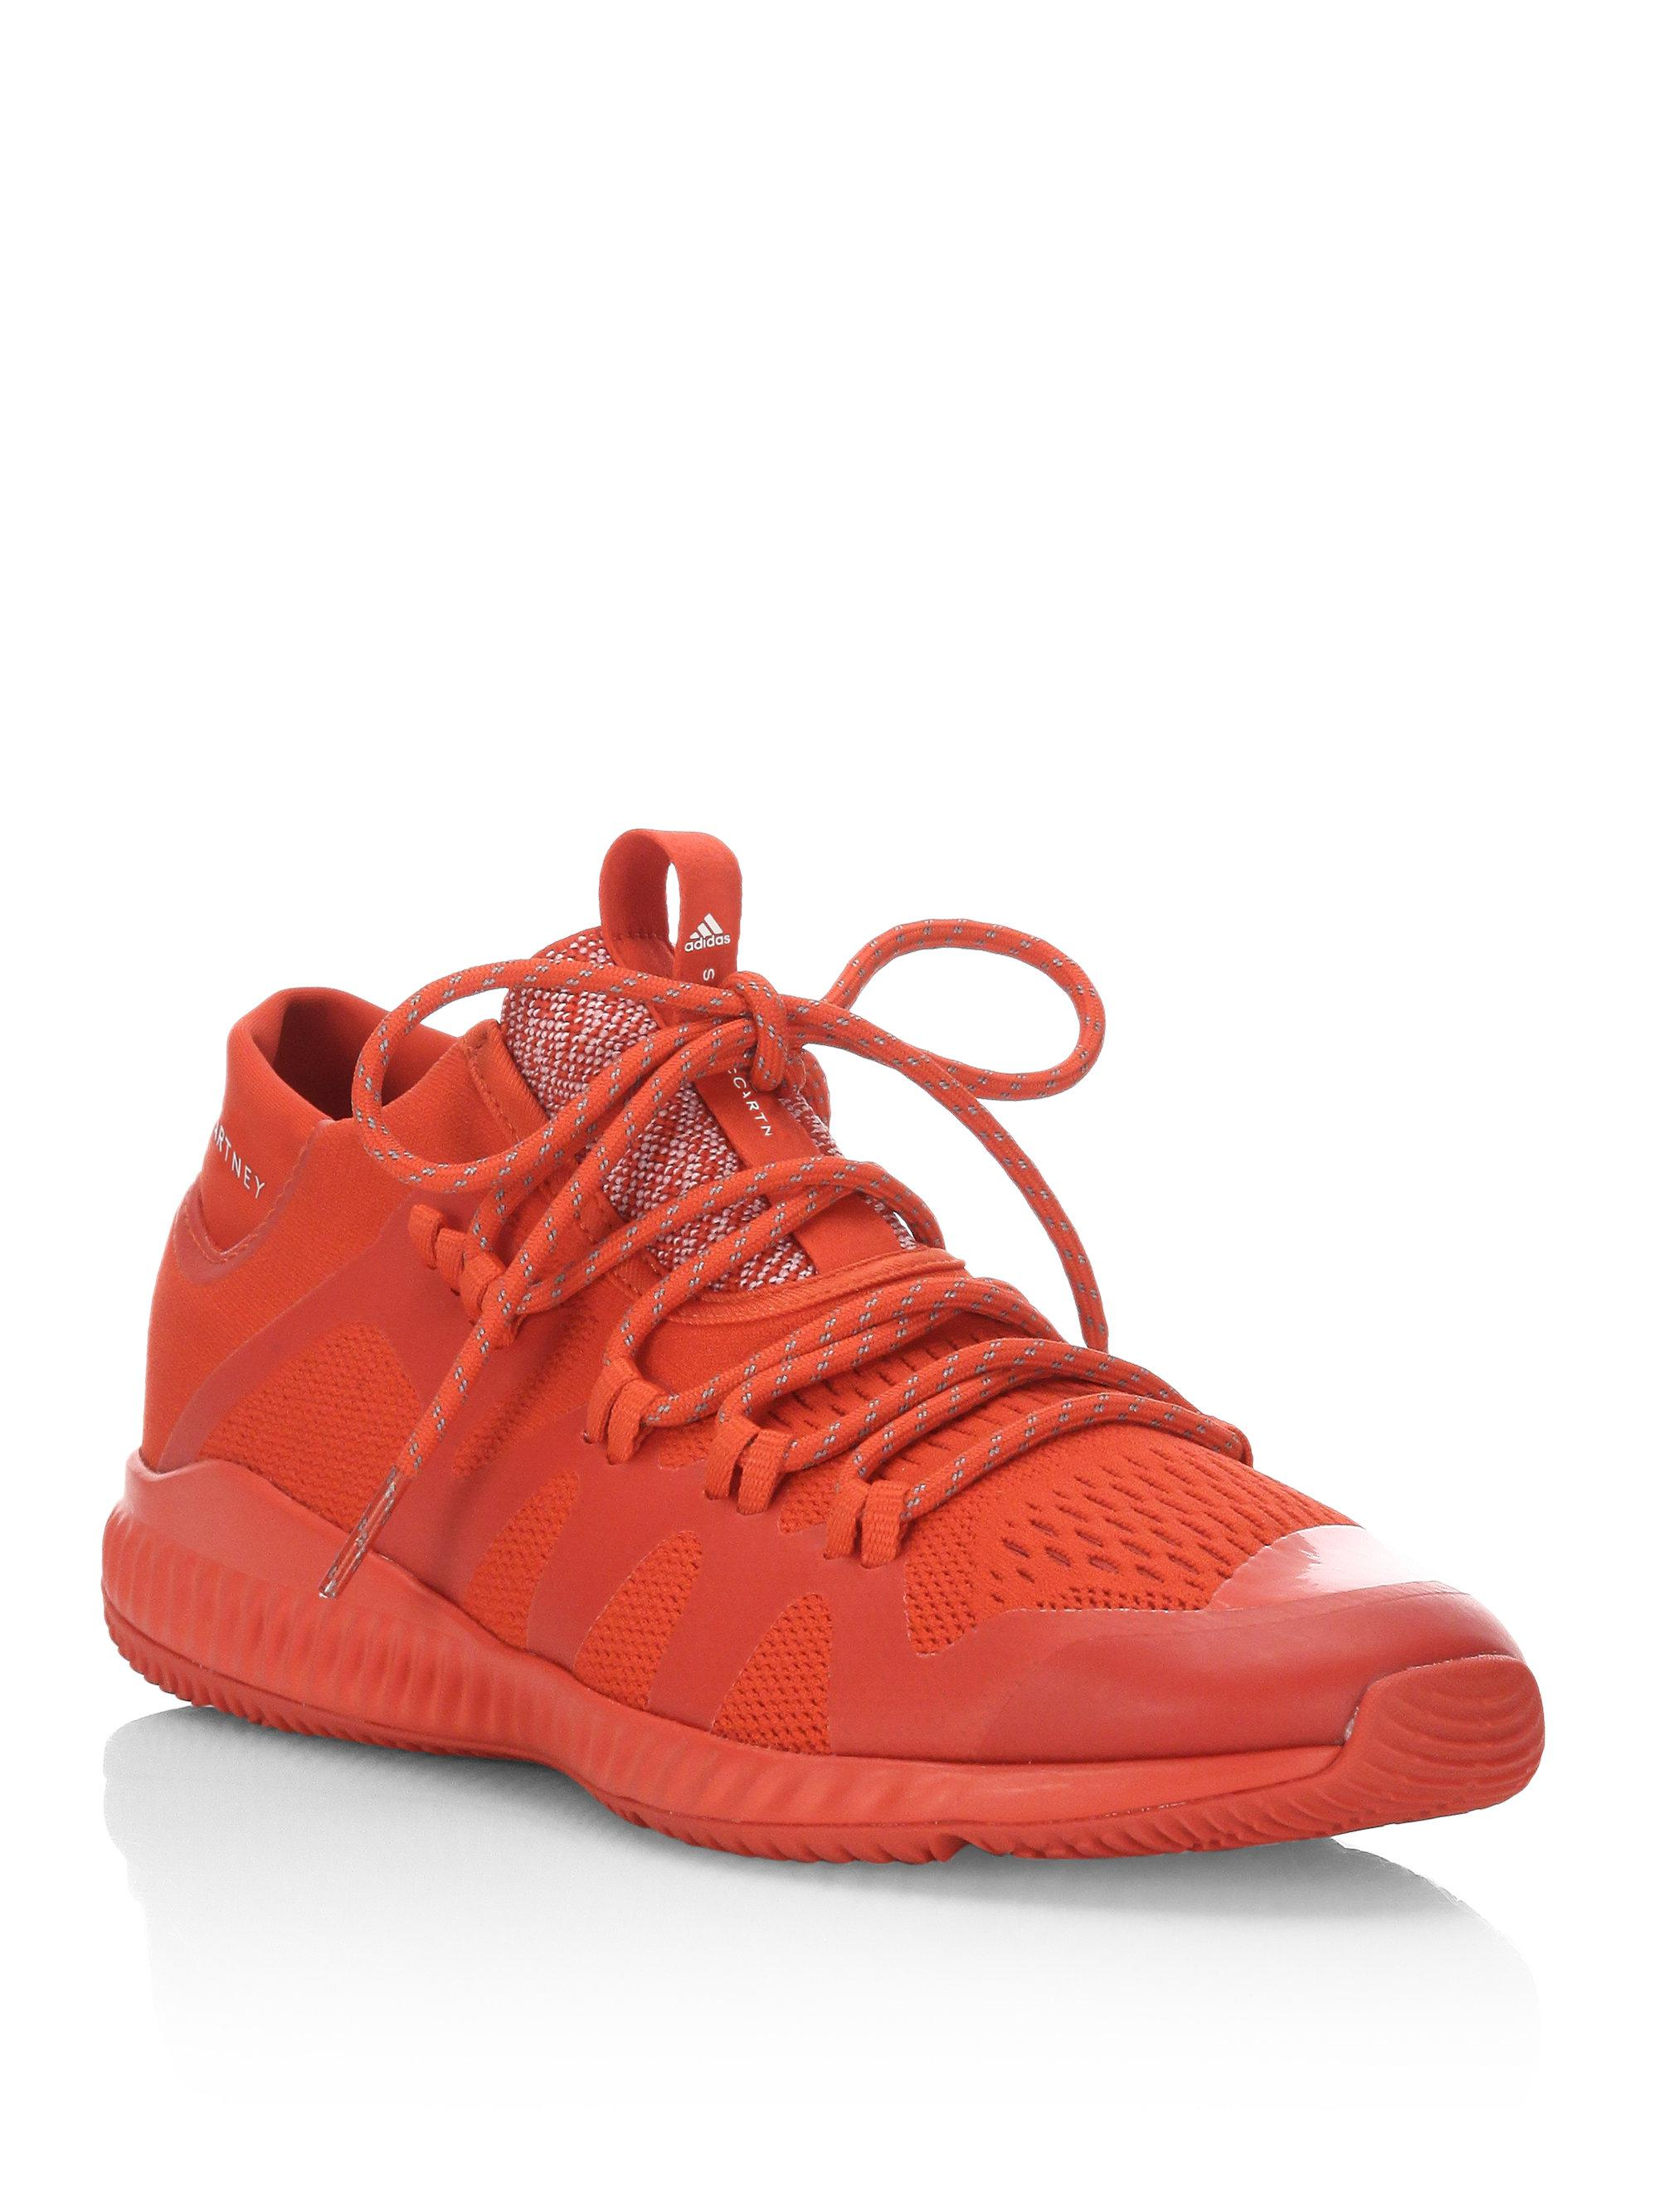 Adidas Par Stella Mccartney Crazytrain Rebond - Milieu Bas-tops Et Chaussures De Sport RTXmCDVHS